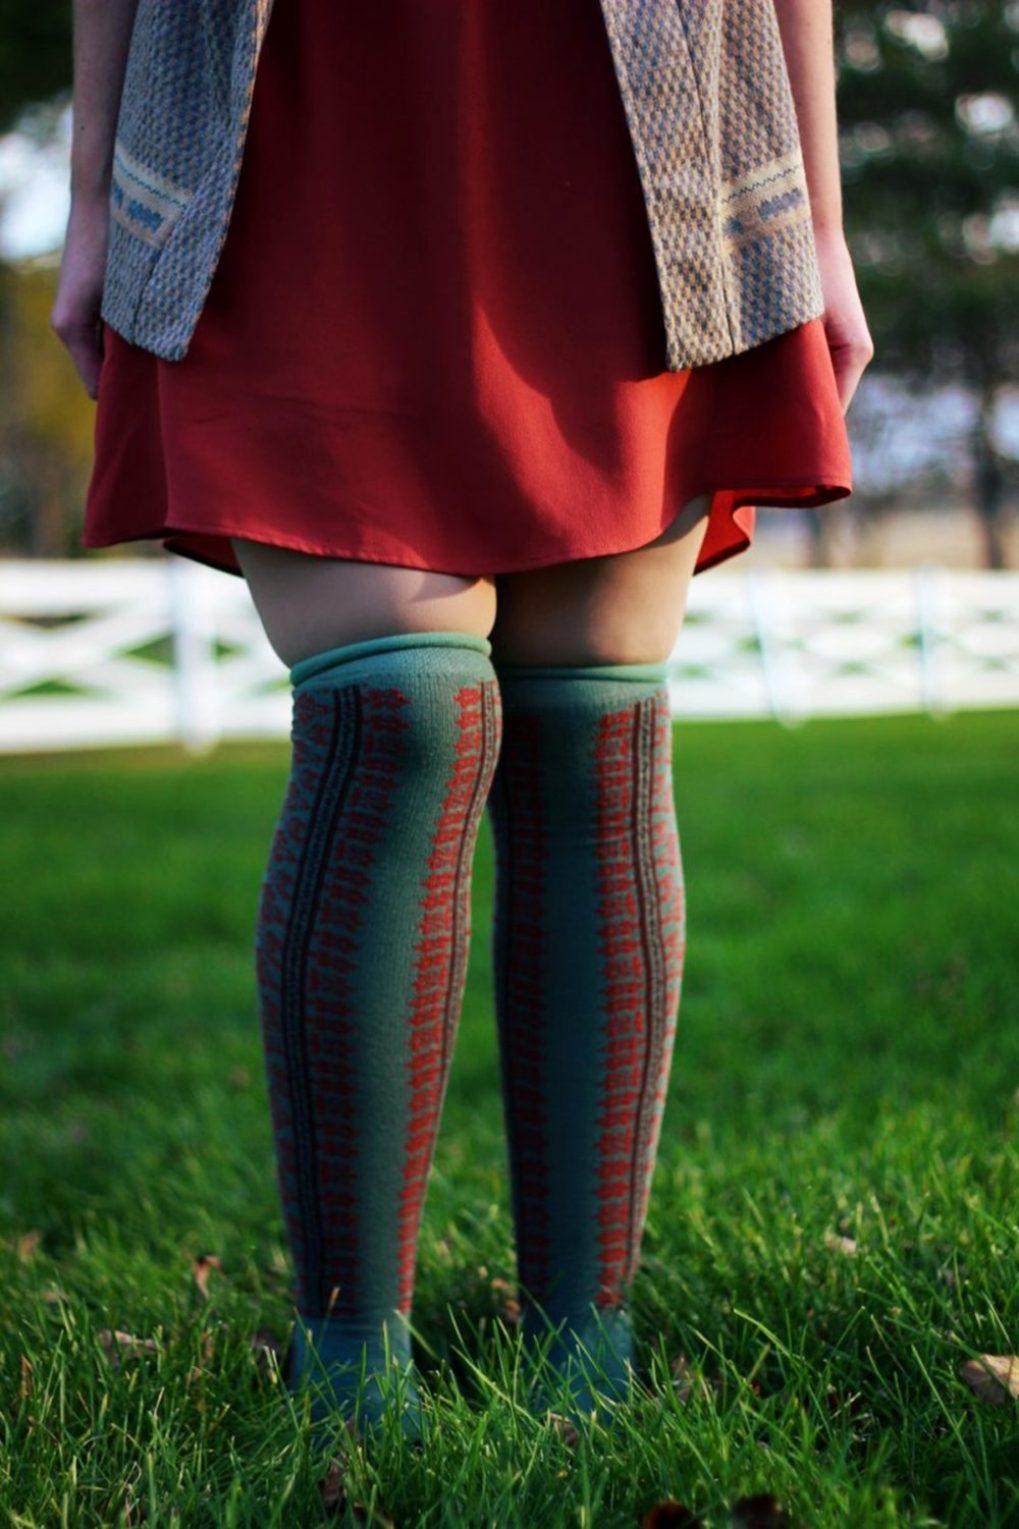 Outfit: Orange dress, otk colorful socks, brown flats